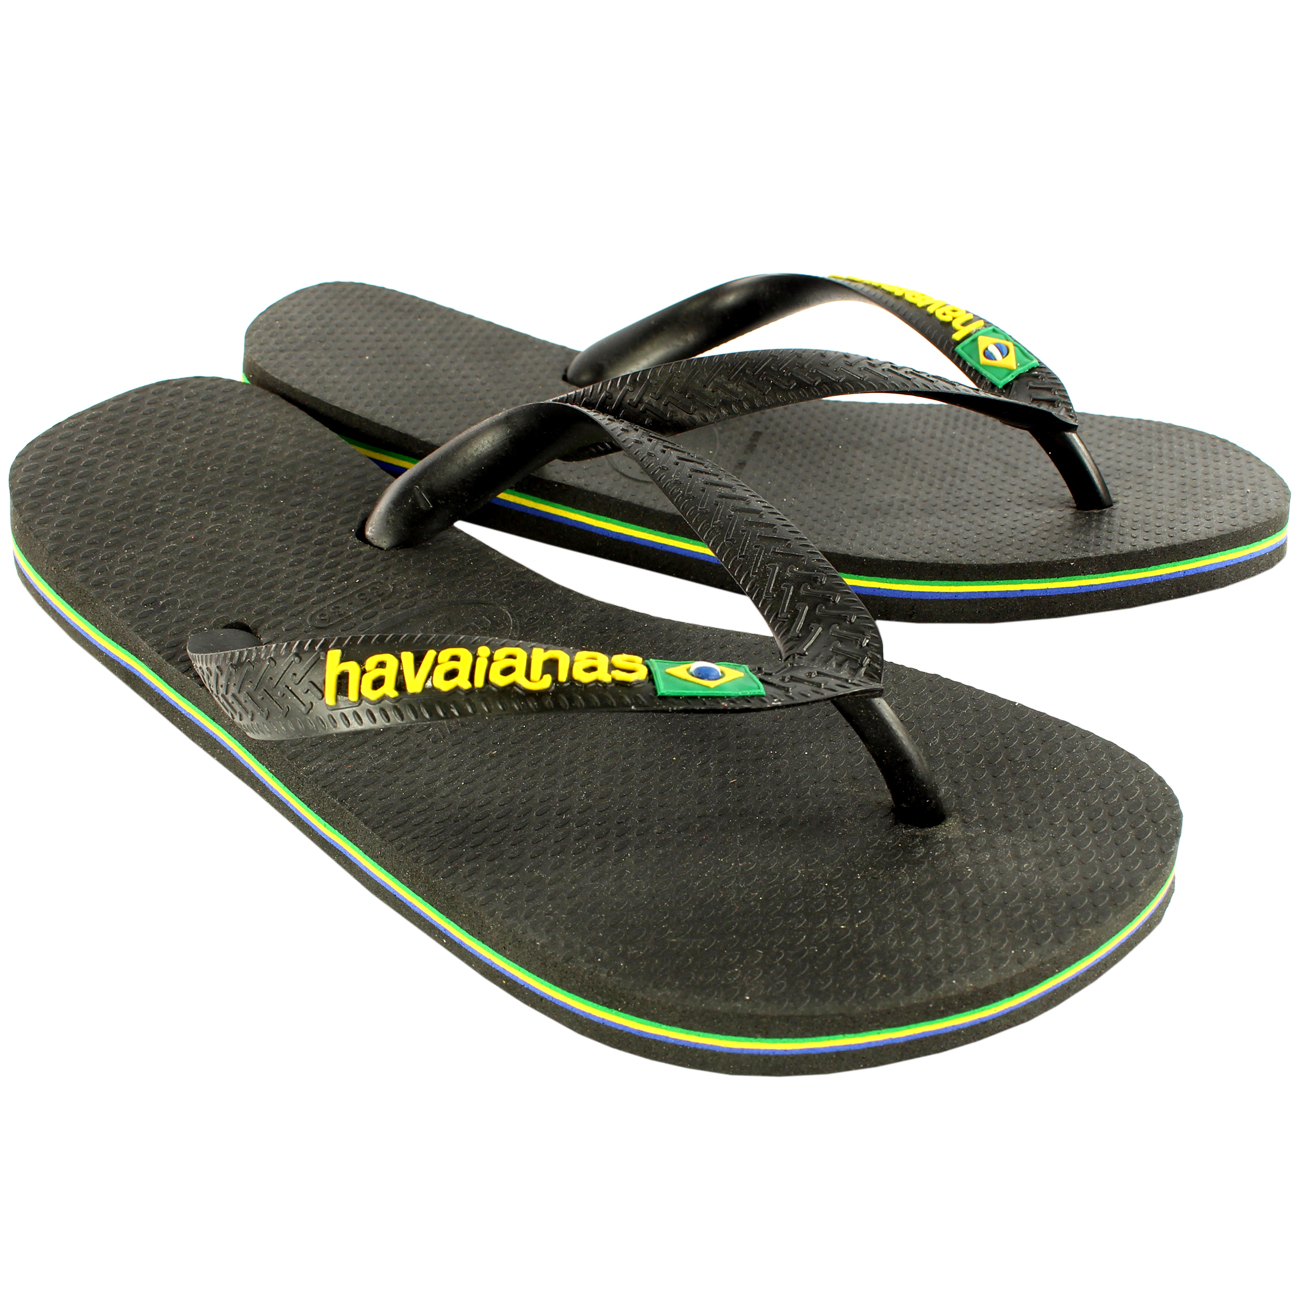 womens havaianas flip flops original box brazil brasil logo ladies sandals 4 9 ebay. Black Bedroom Furniture Sets. Home Design Ideas